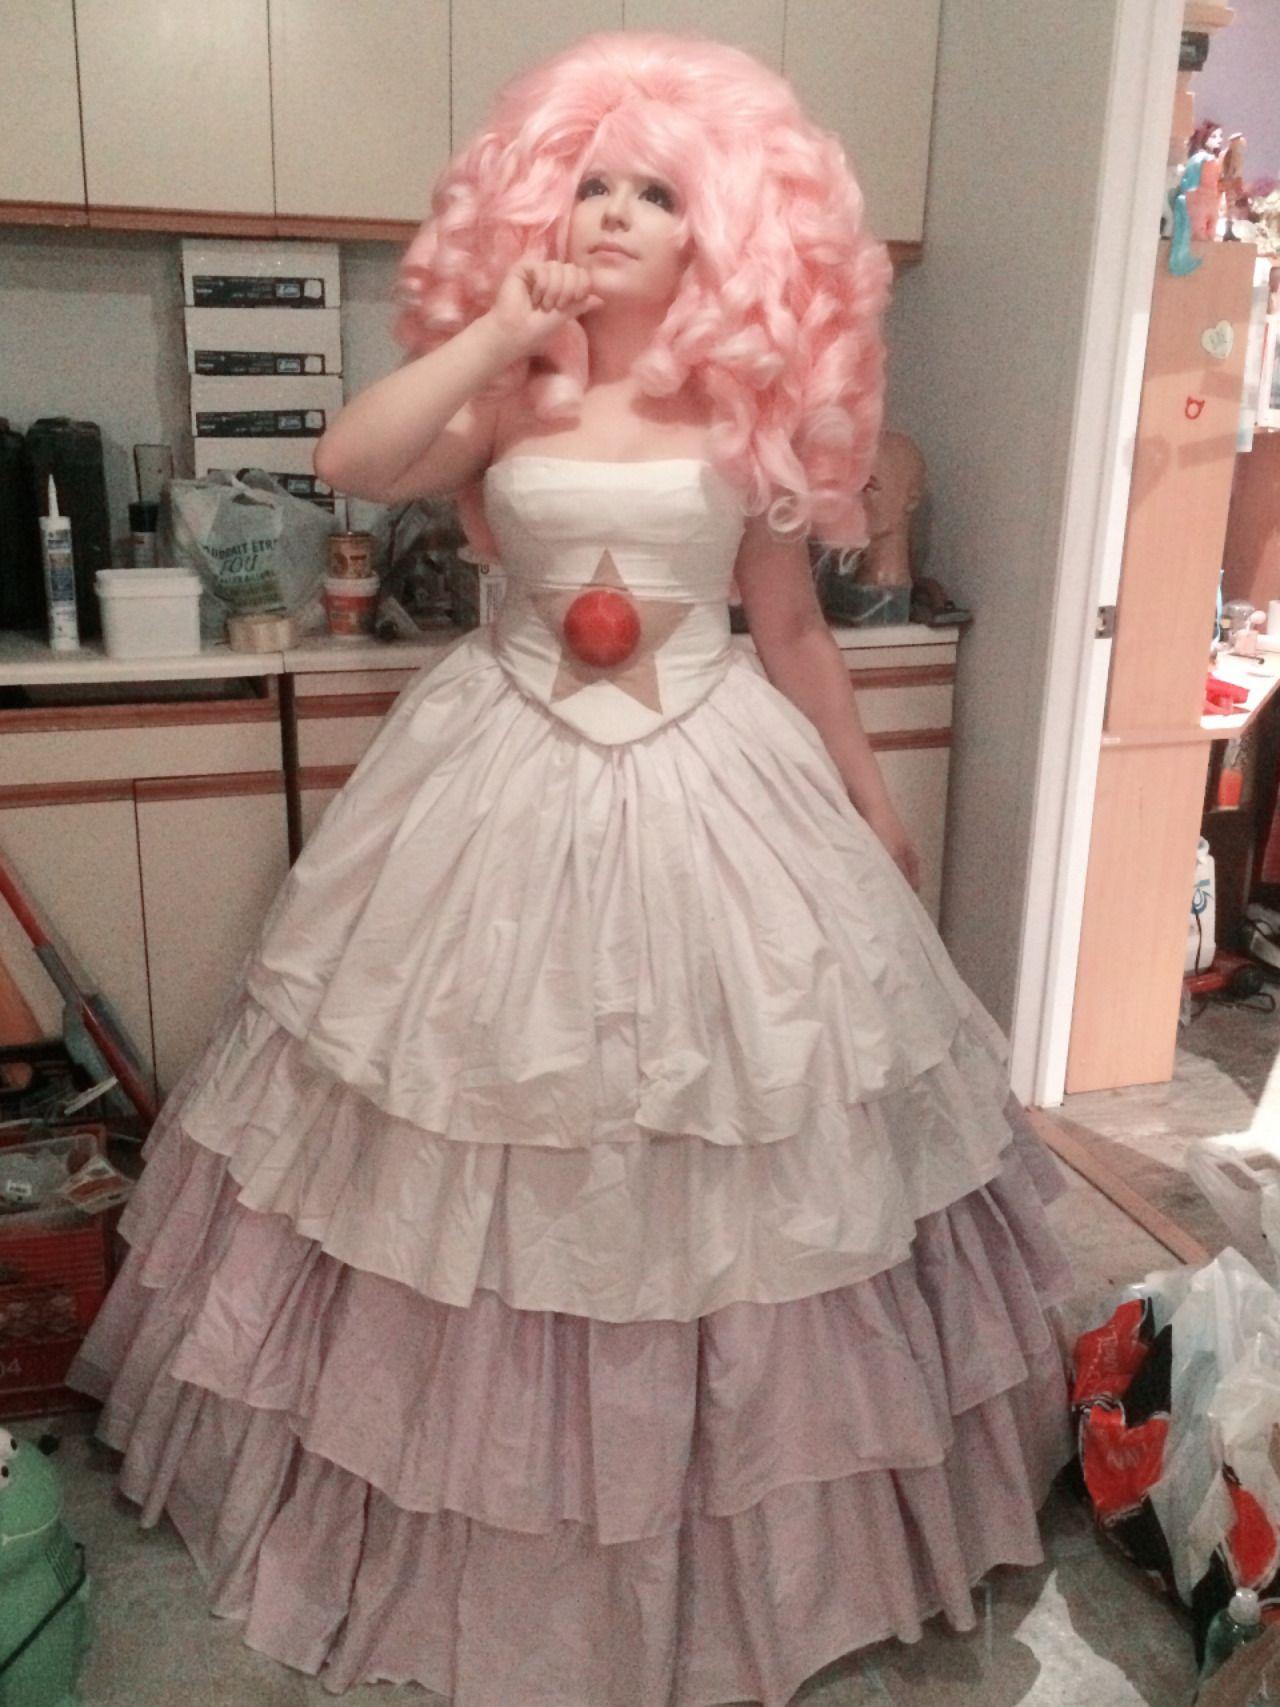 Accept. The rose quartz cosplay dress